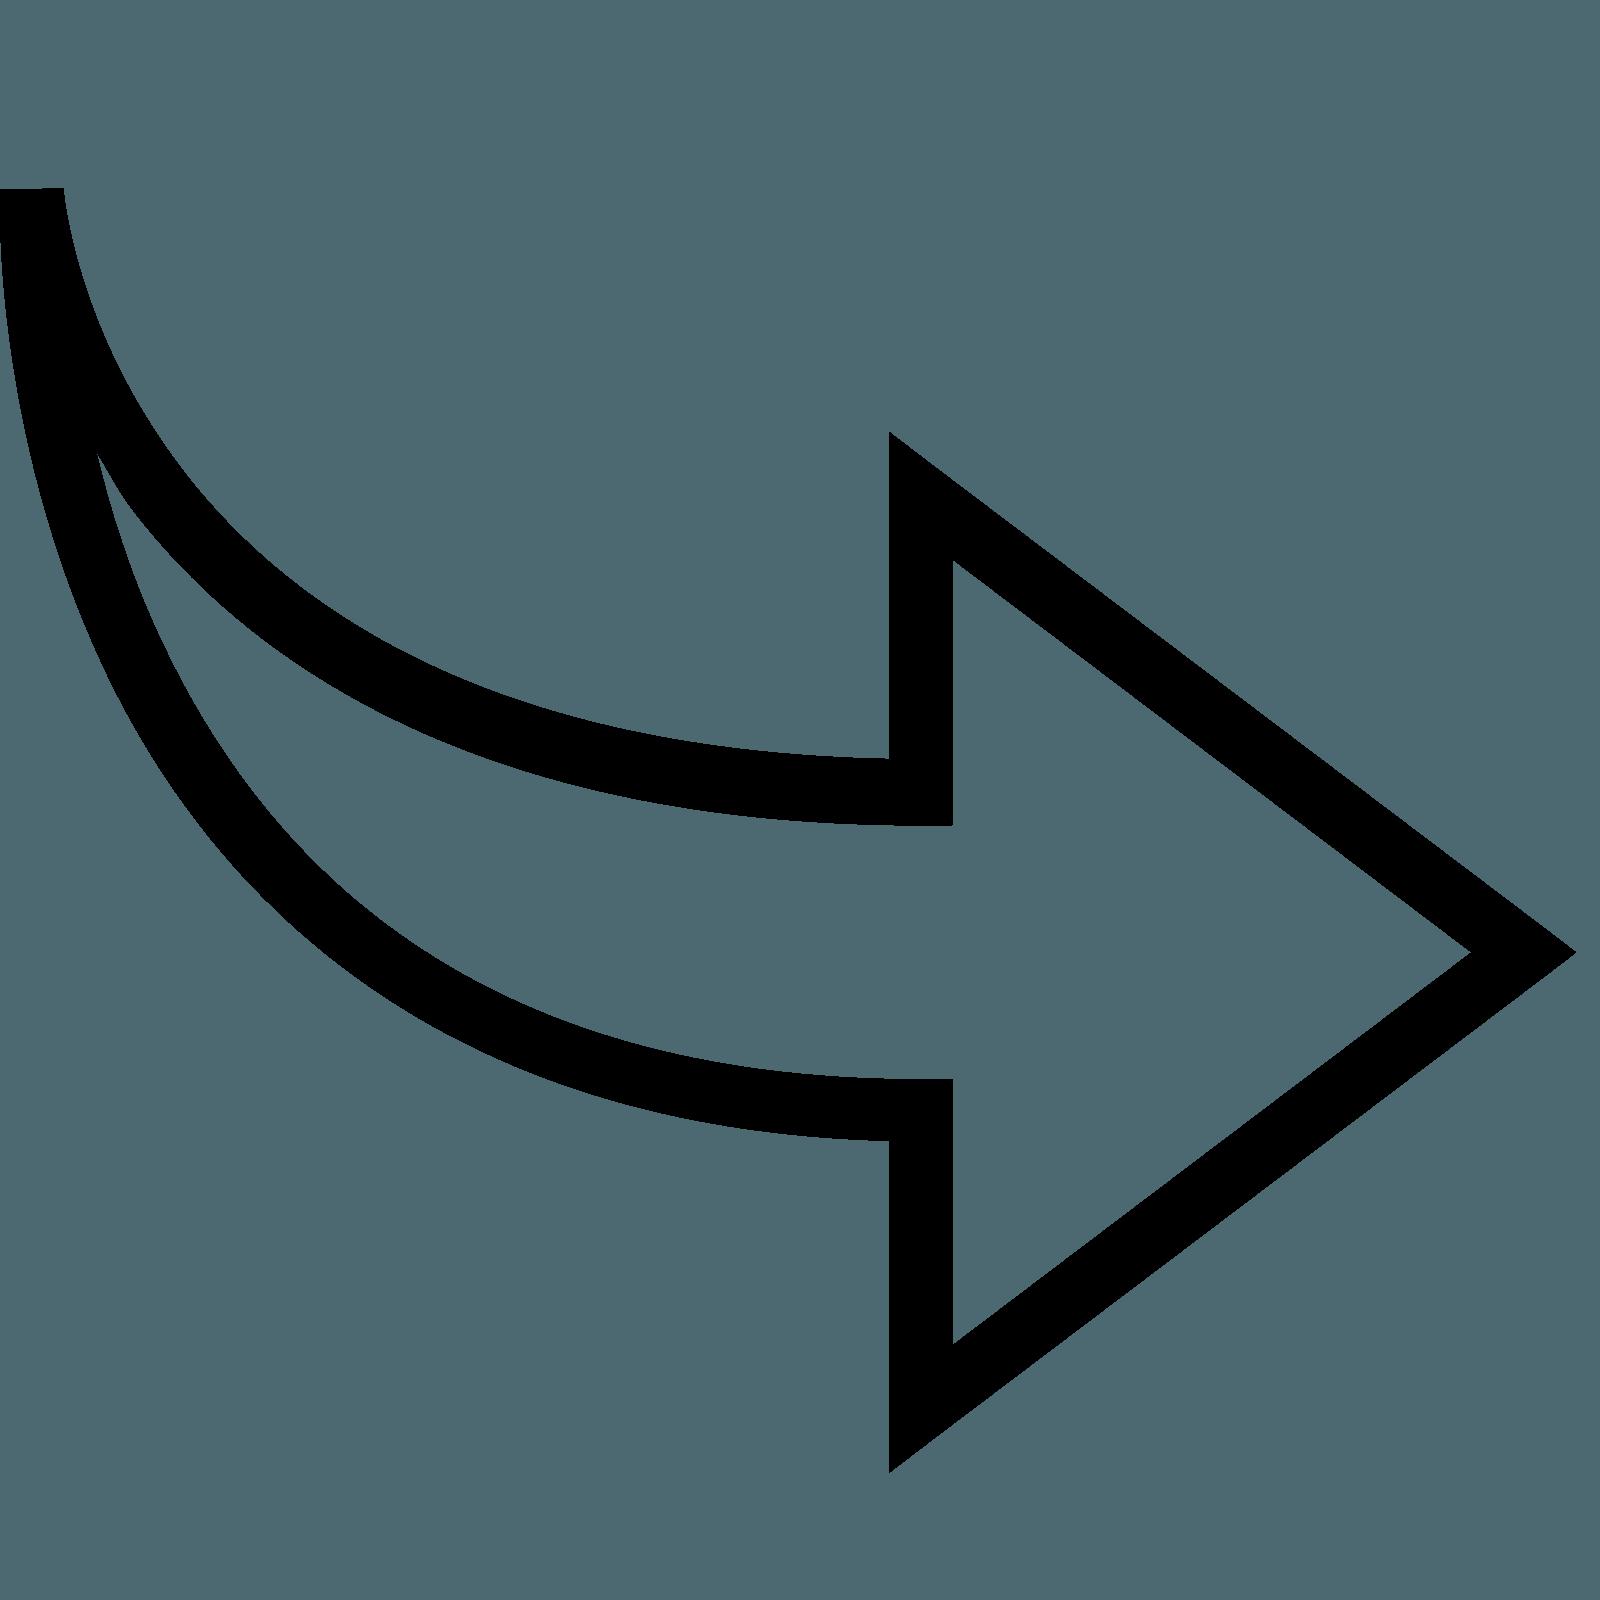 Curved Arrow Logo